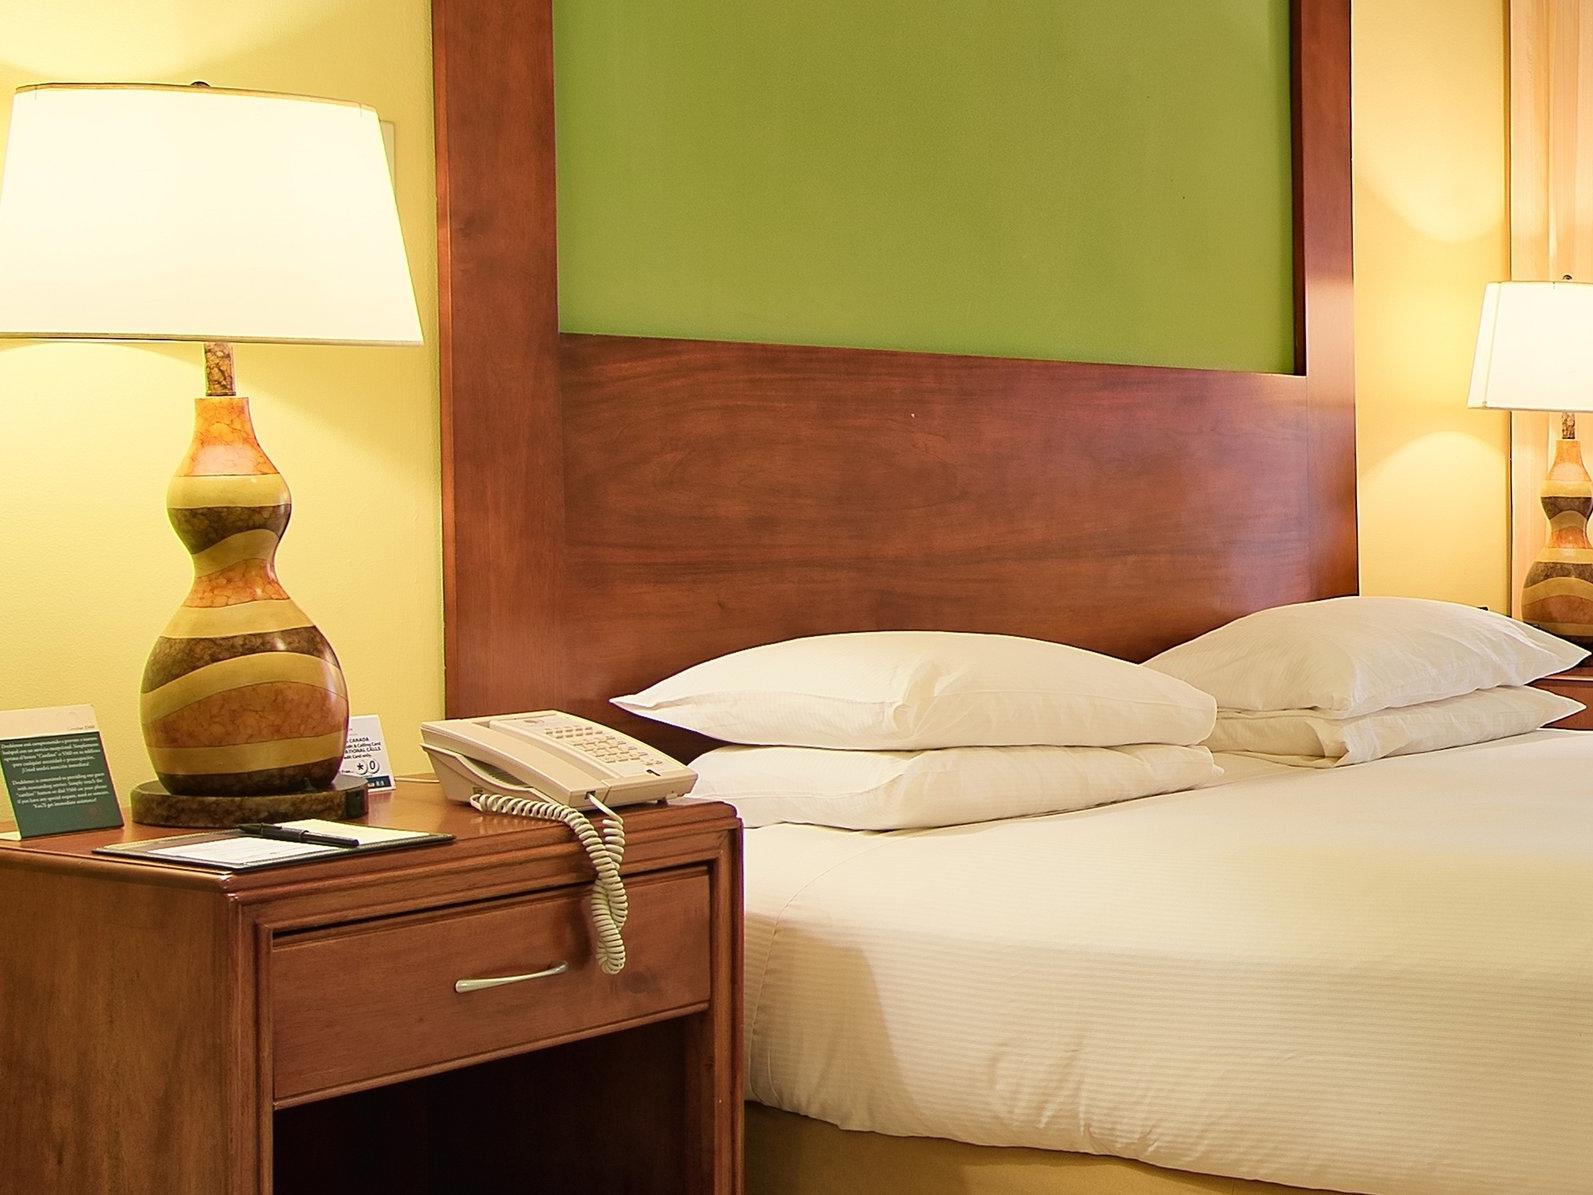 Ocean view 1 king bed with lamp at fiesta Resort